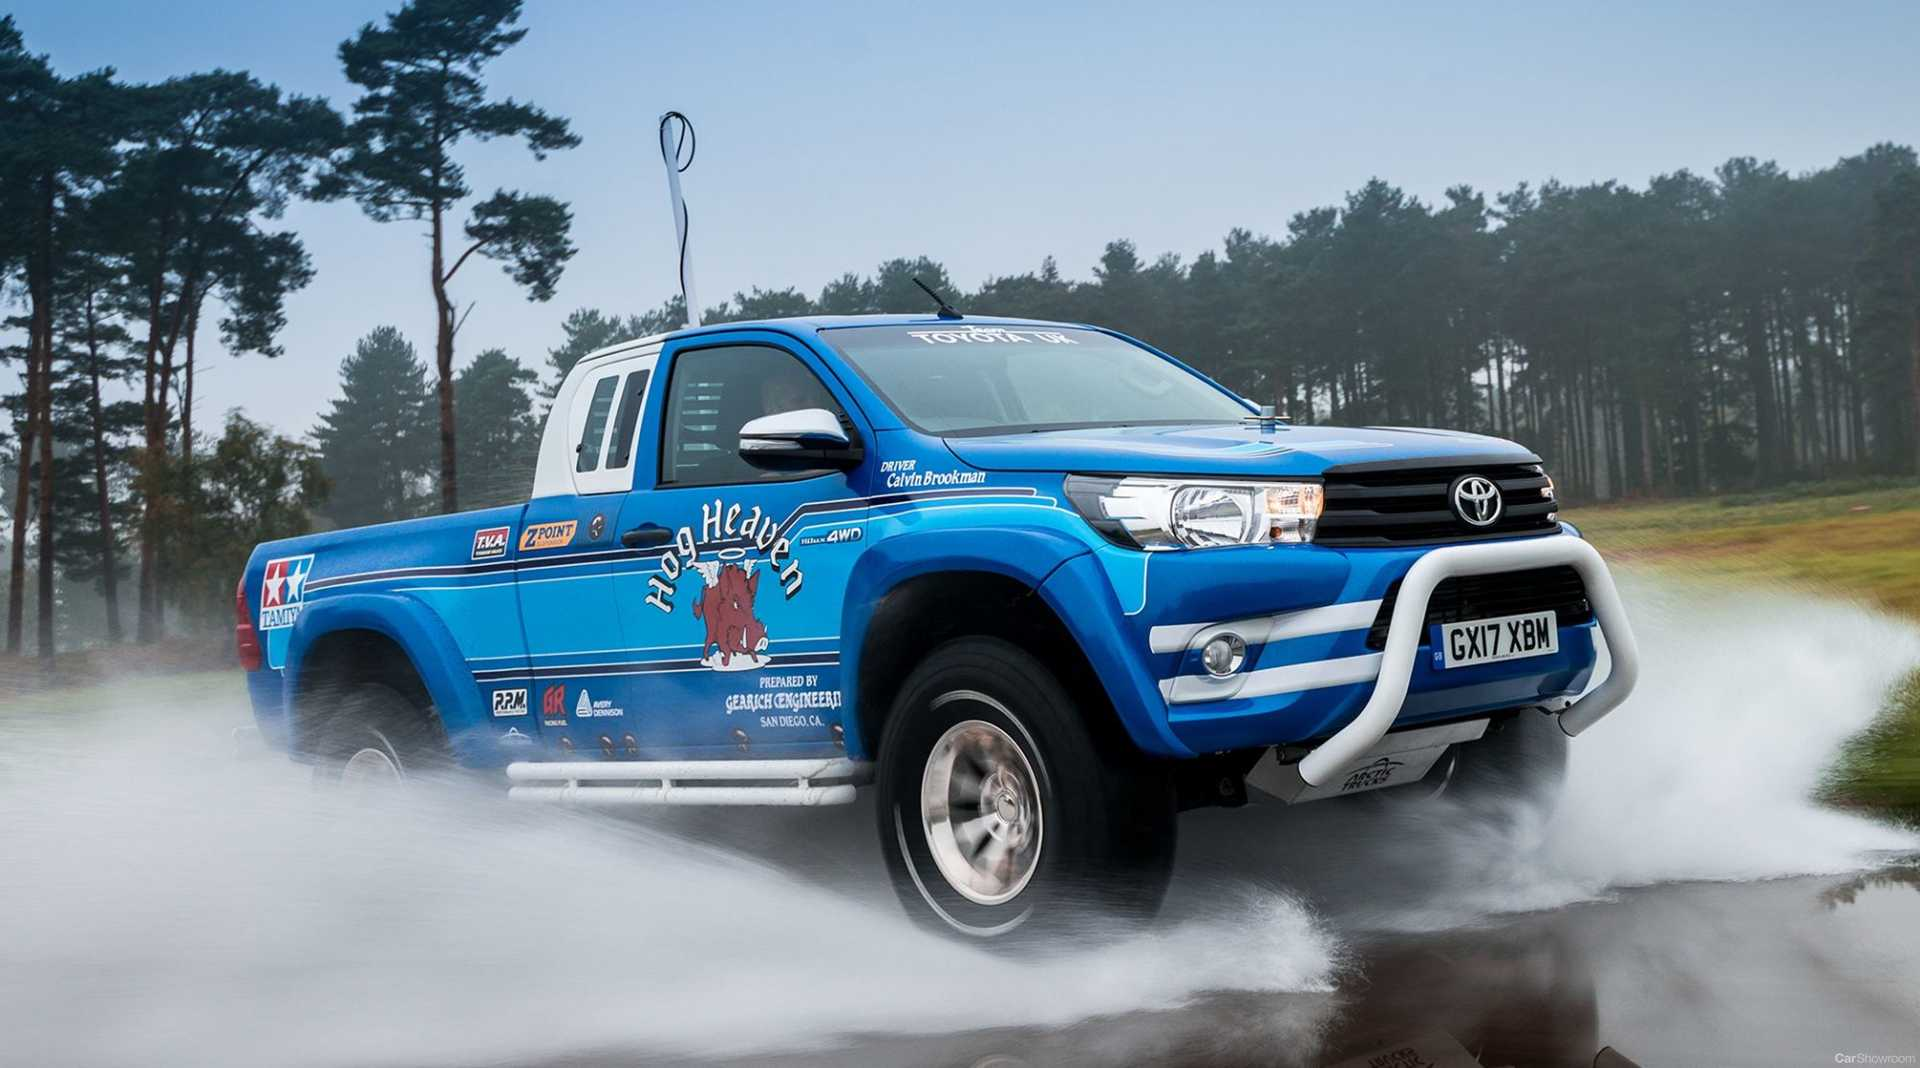 Kelebihan Kekurangan Toyota Hilux Offroad Harga